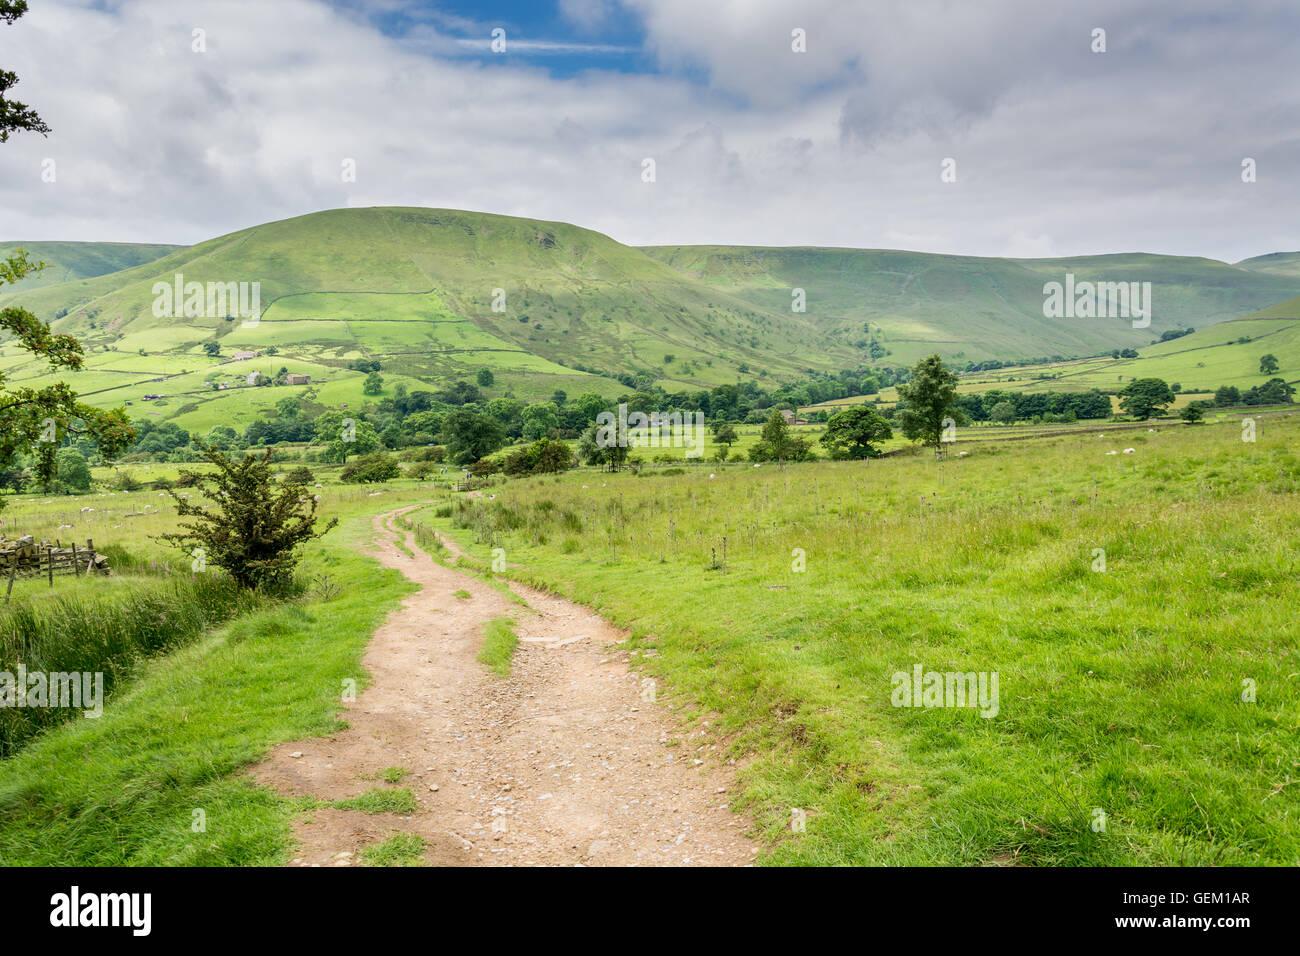 Peak district Landscape,Edale England - Stock Image